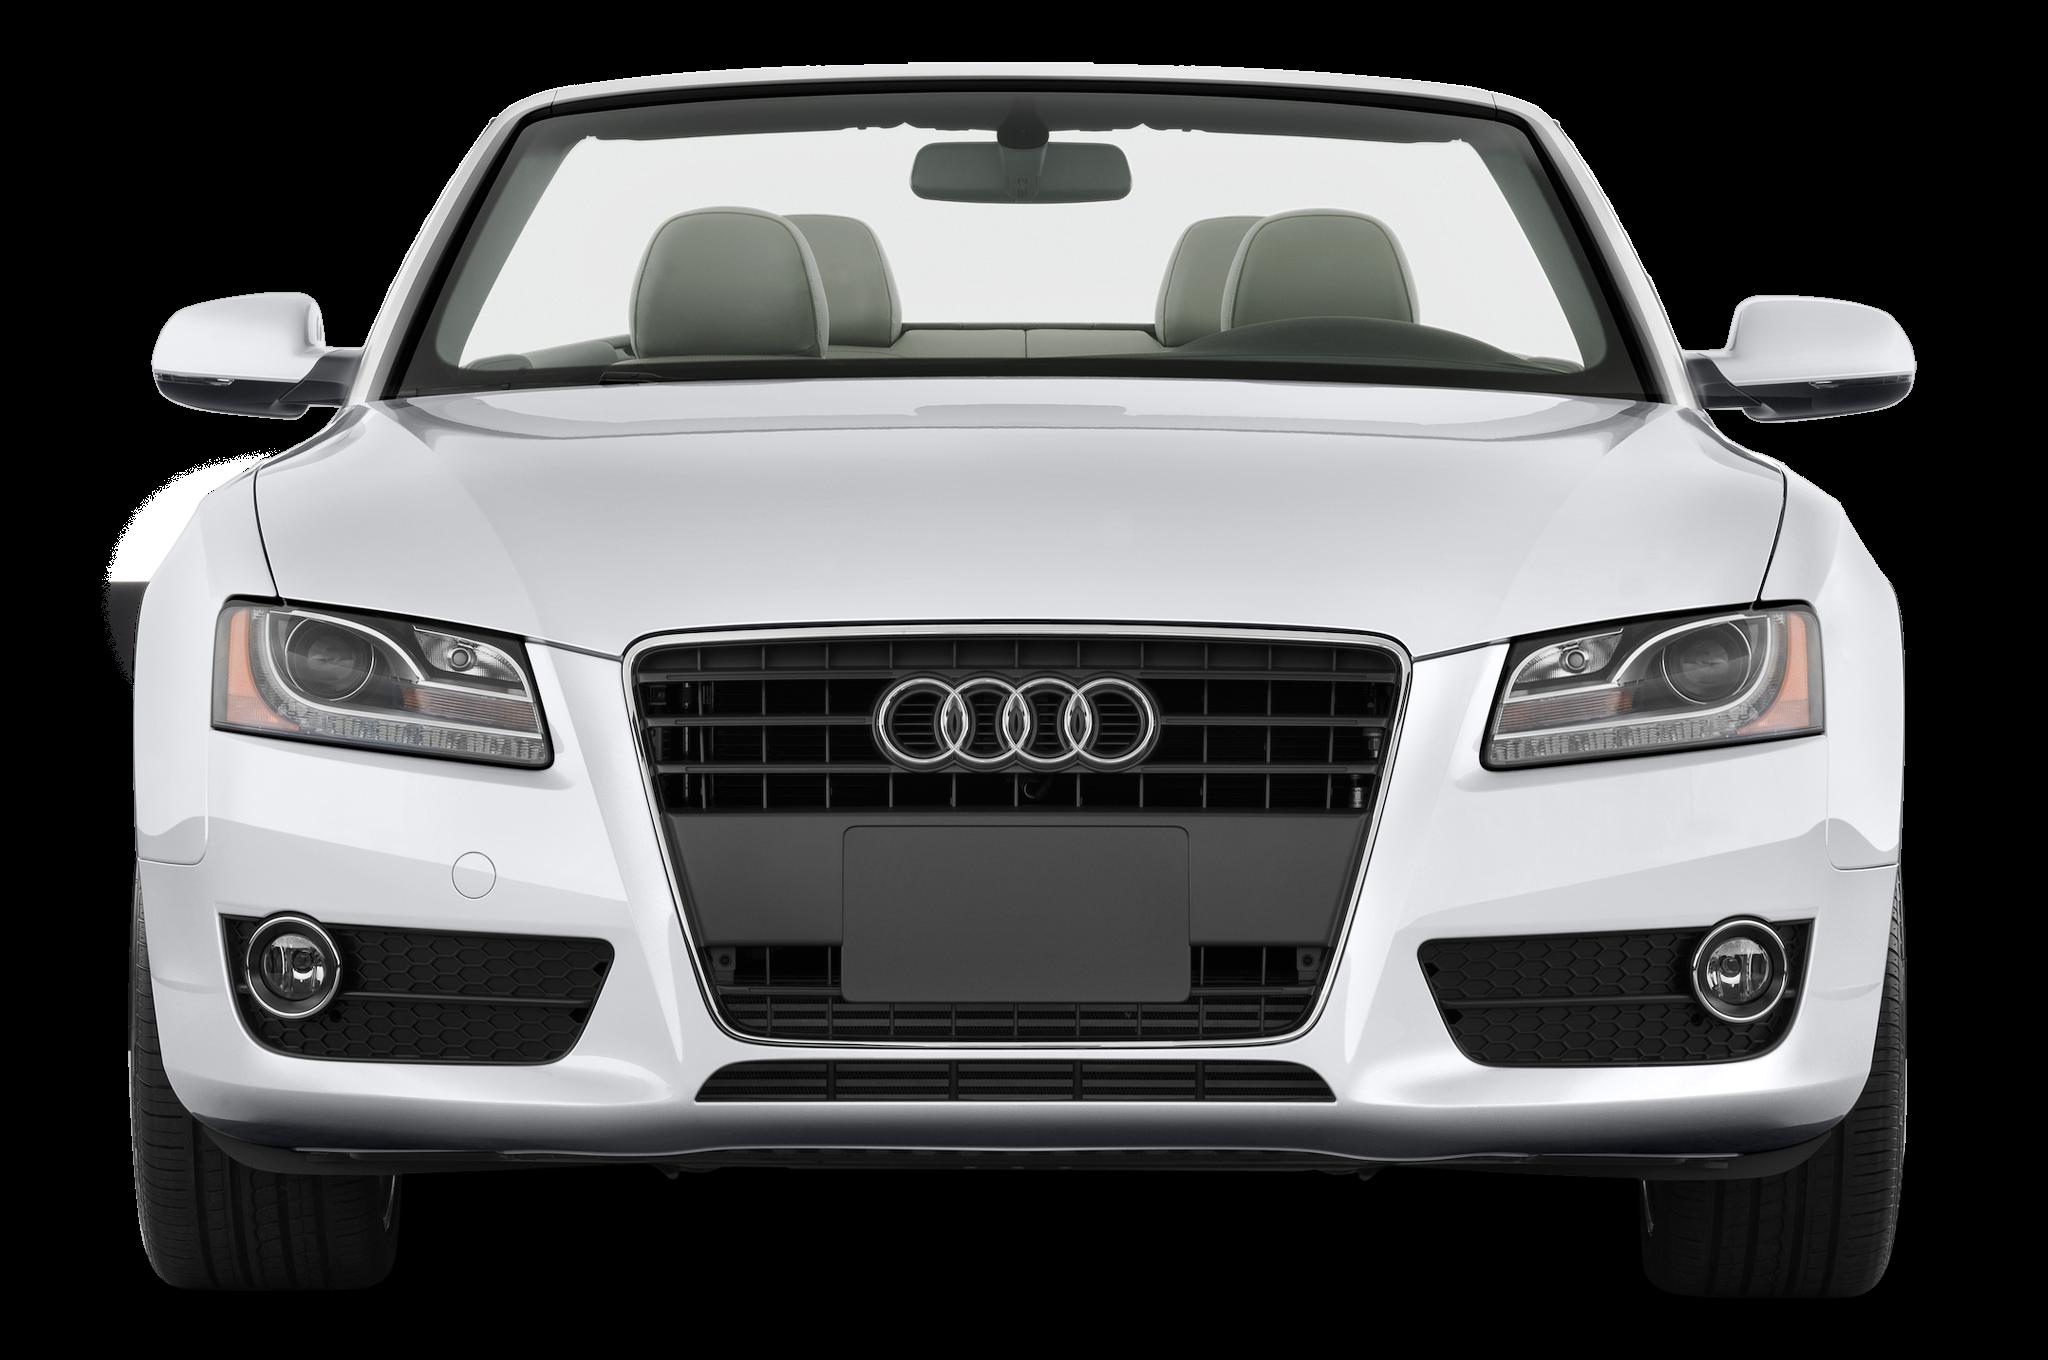 Audi A5 2 0t Quattro Manual Premium 2010 Manual Guide